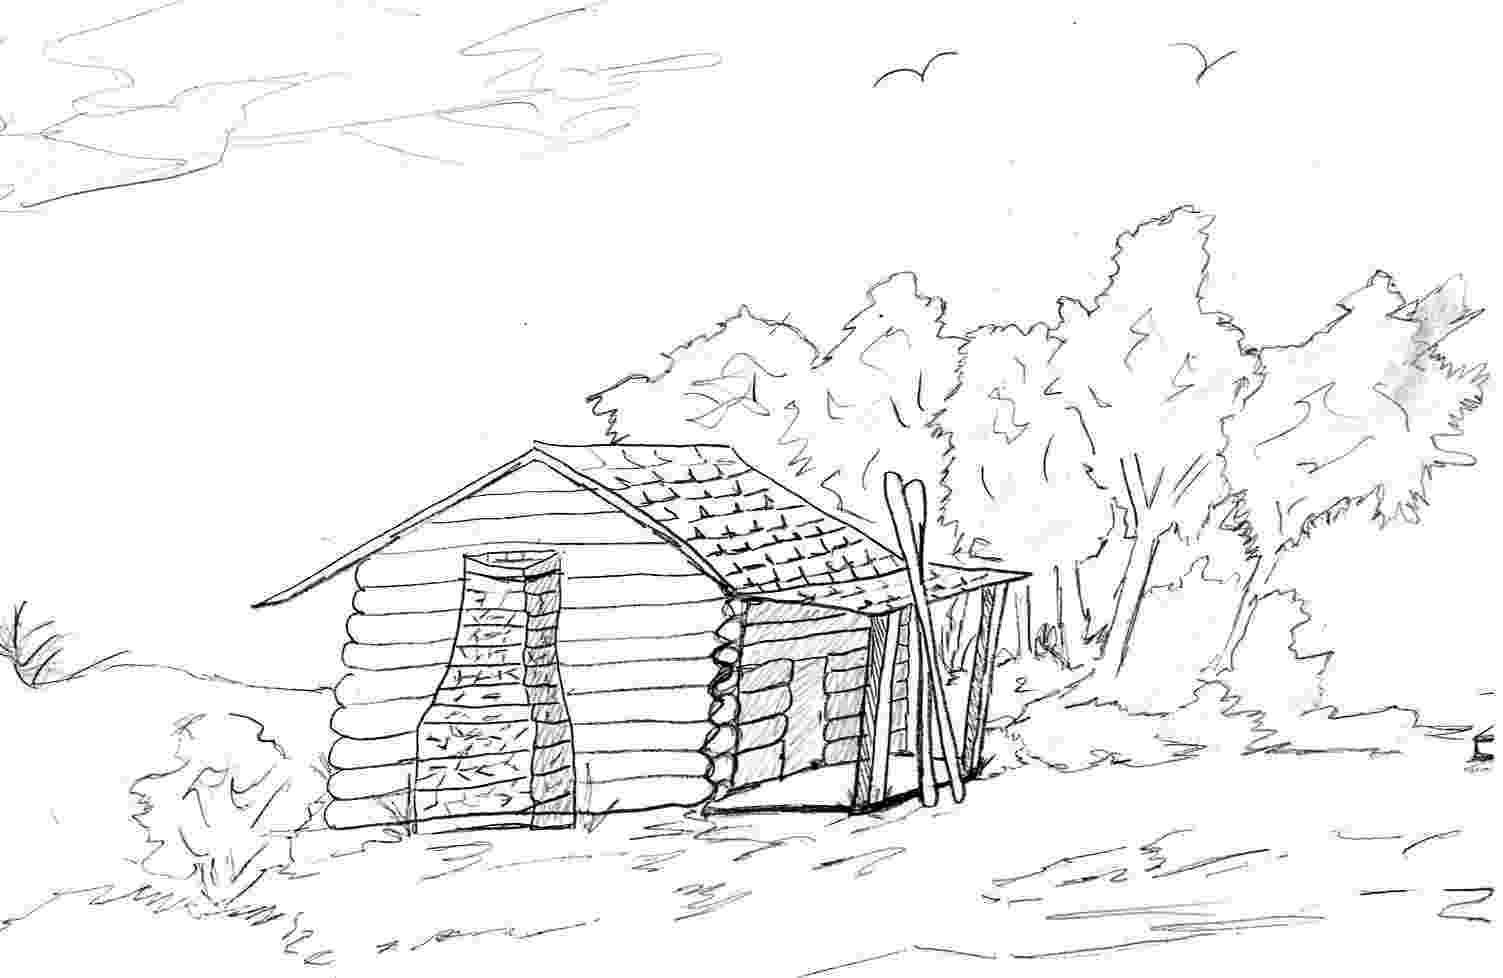 log cabin coloring page log cabin coloring page clipart best log page coloring cabin